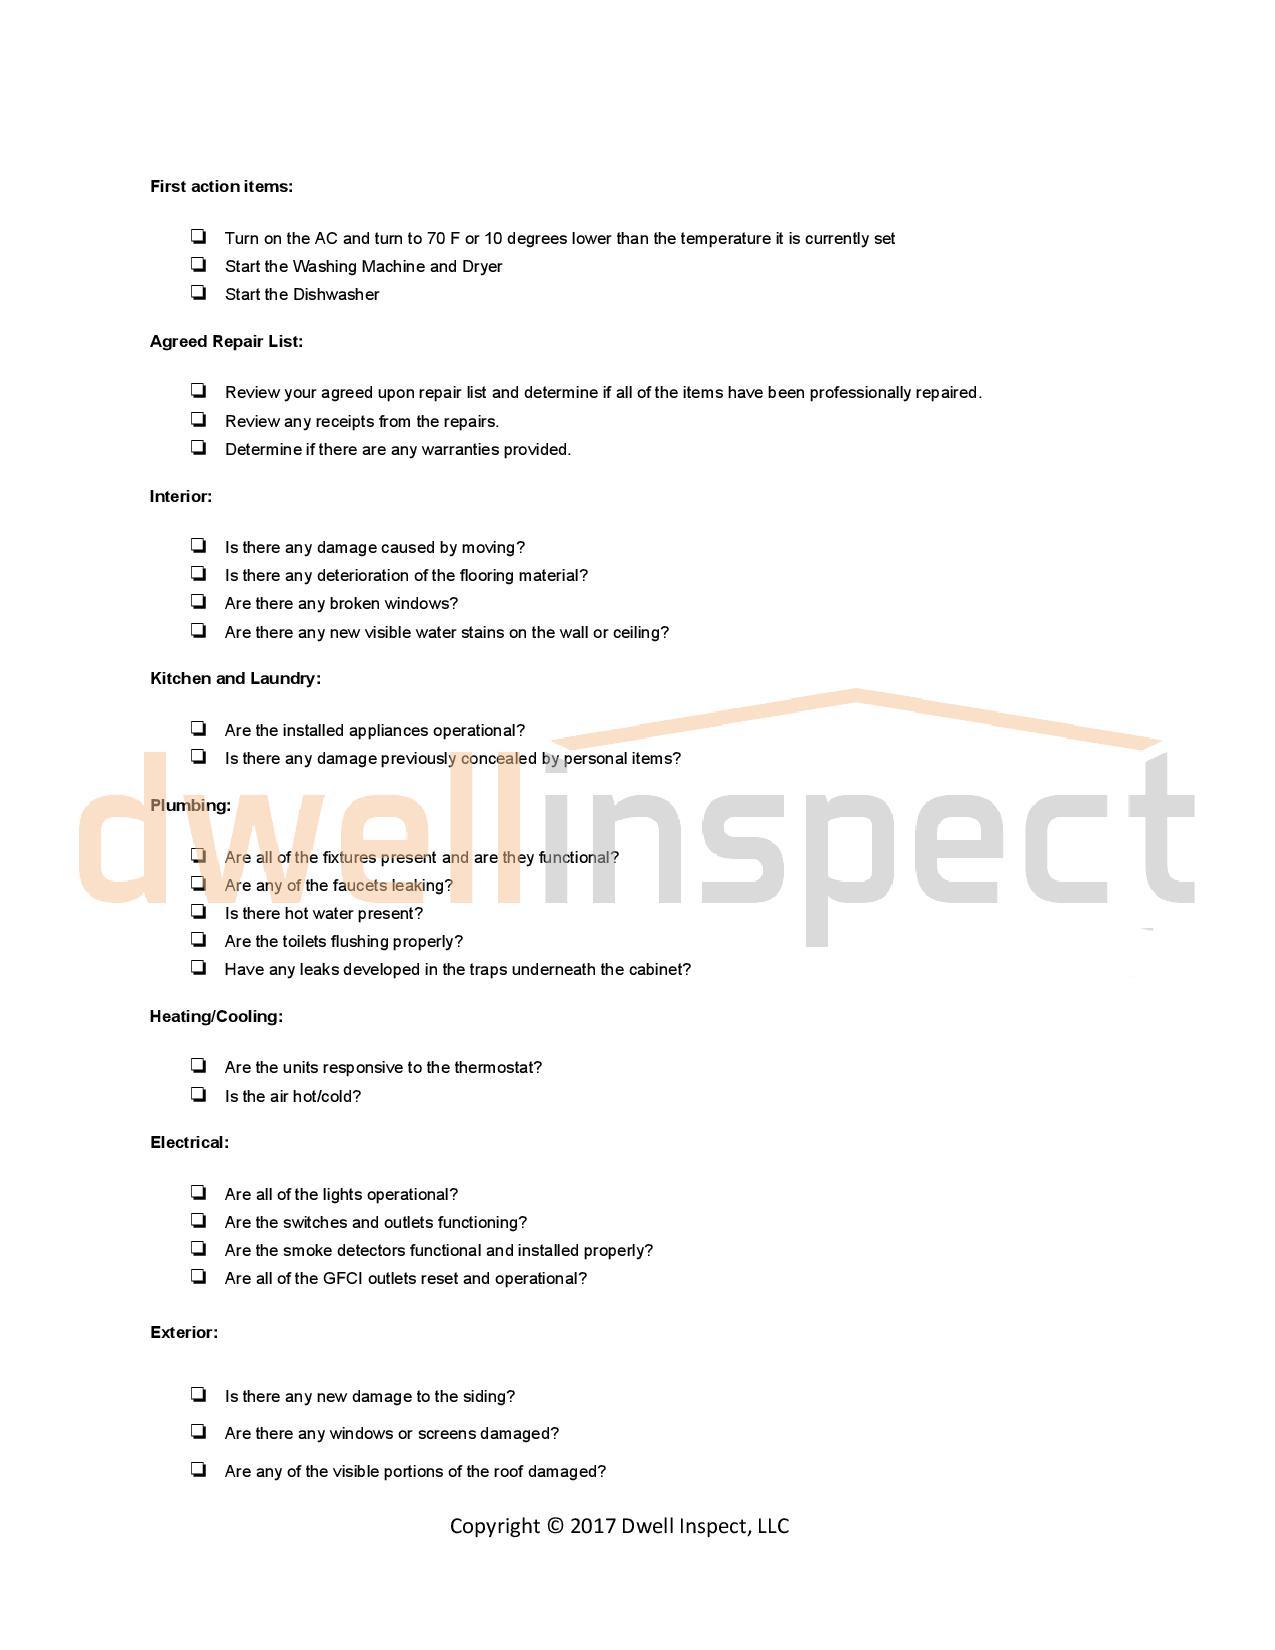 Final Walkthrough Checklist